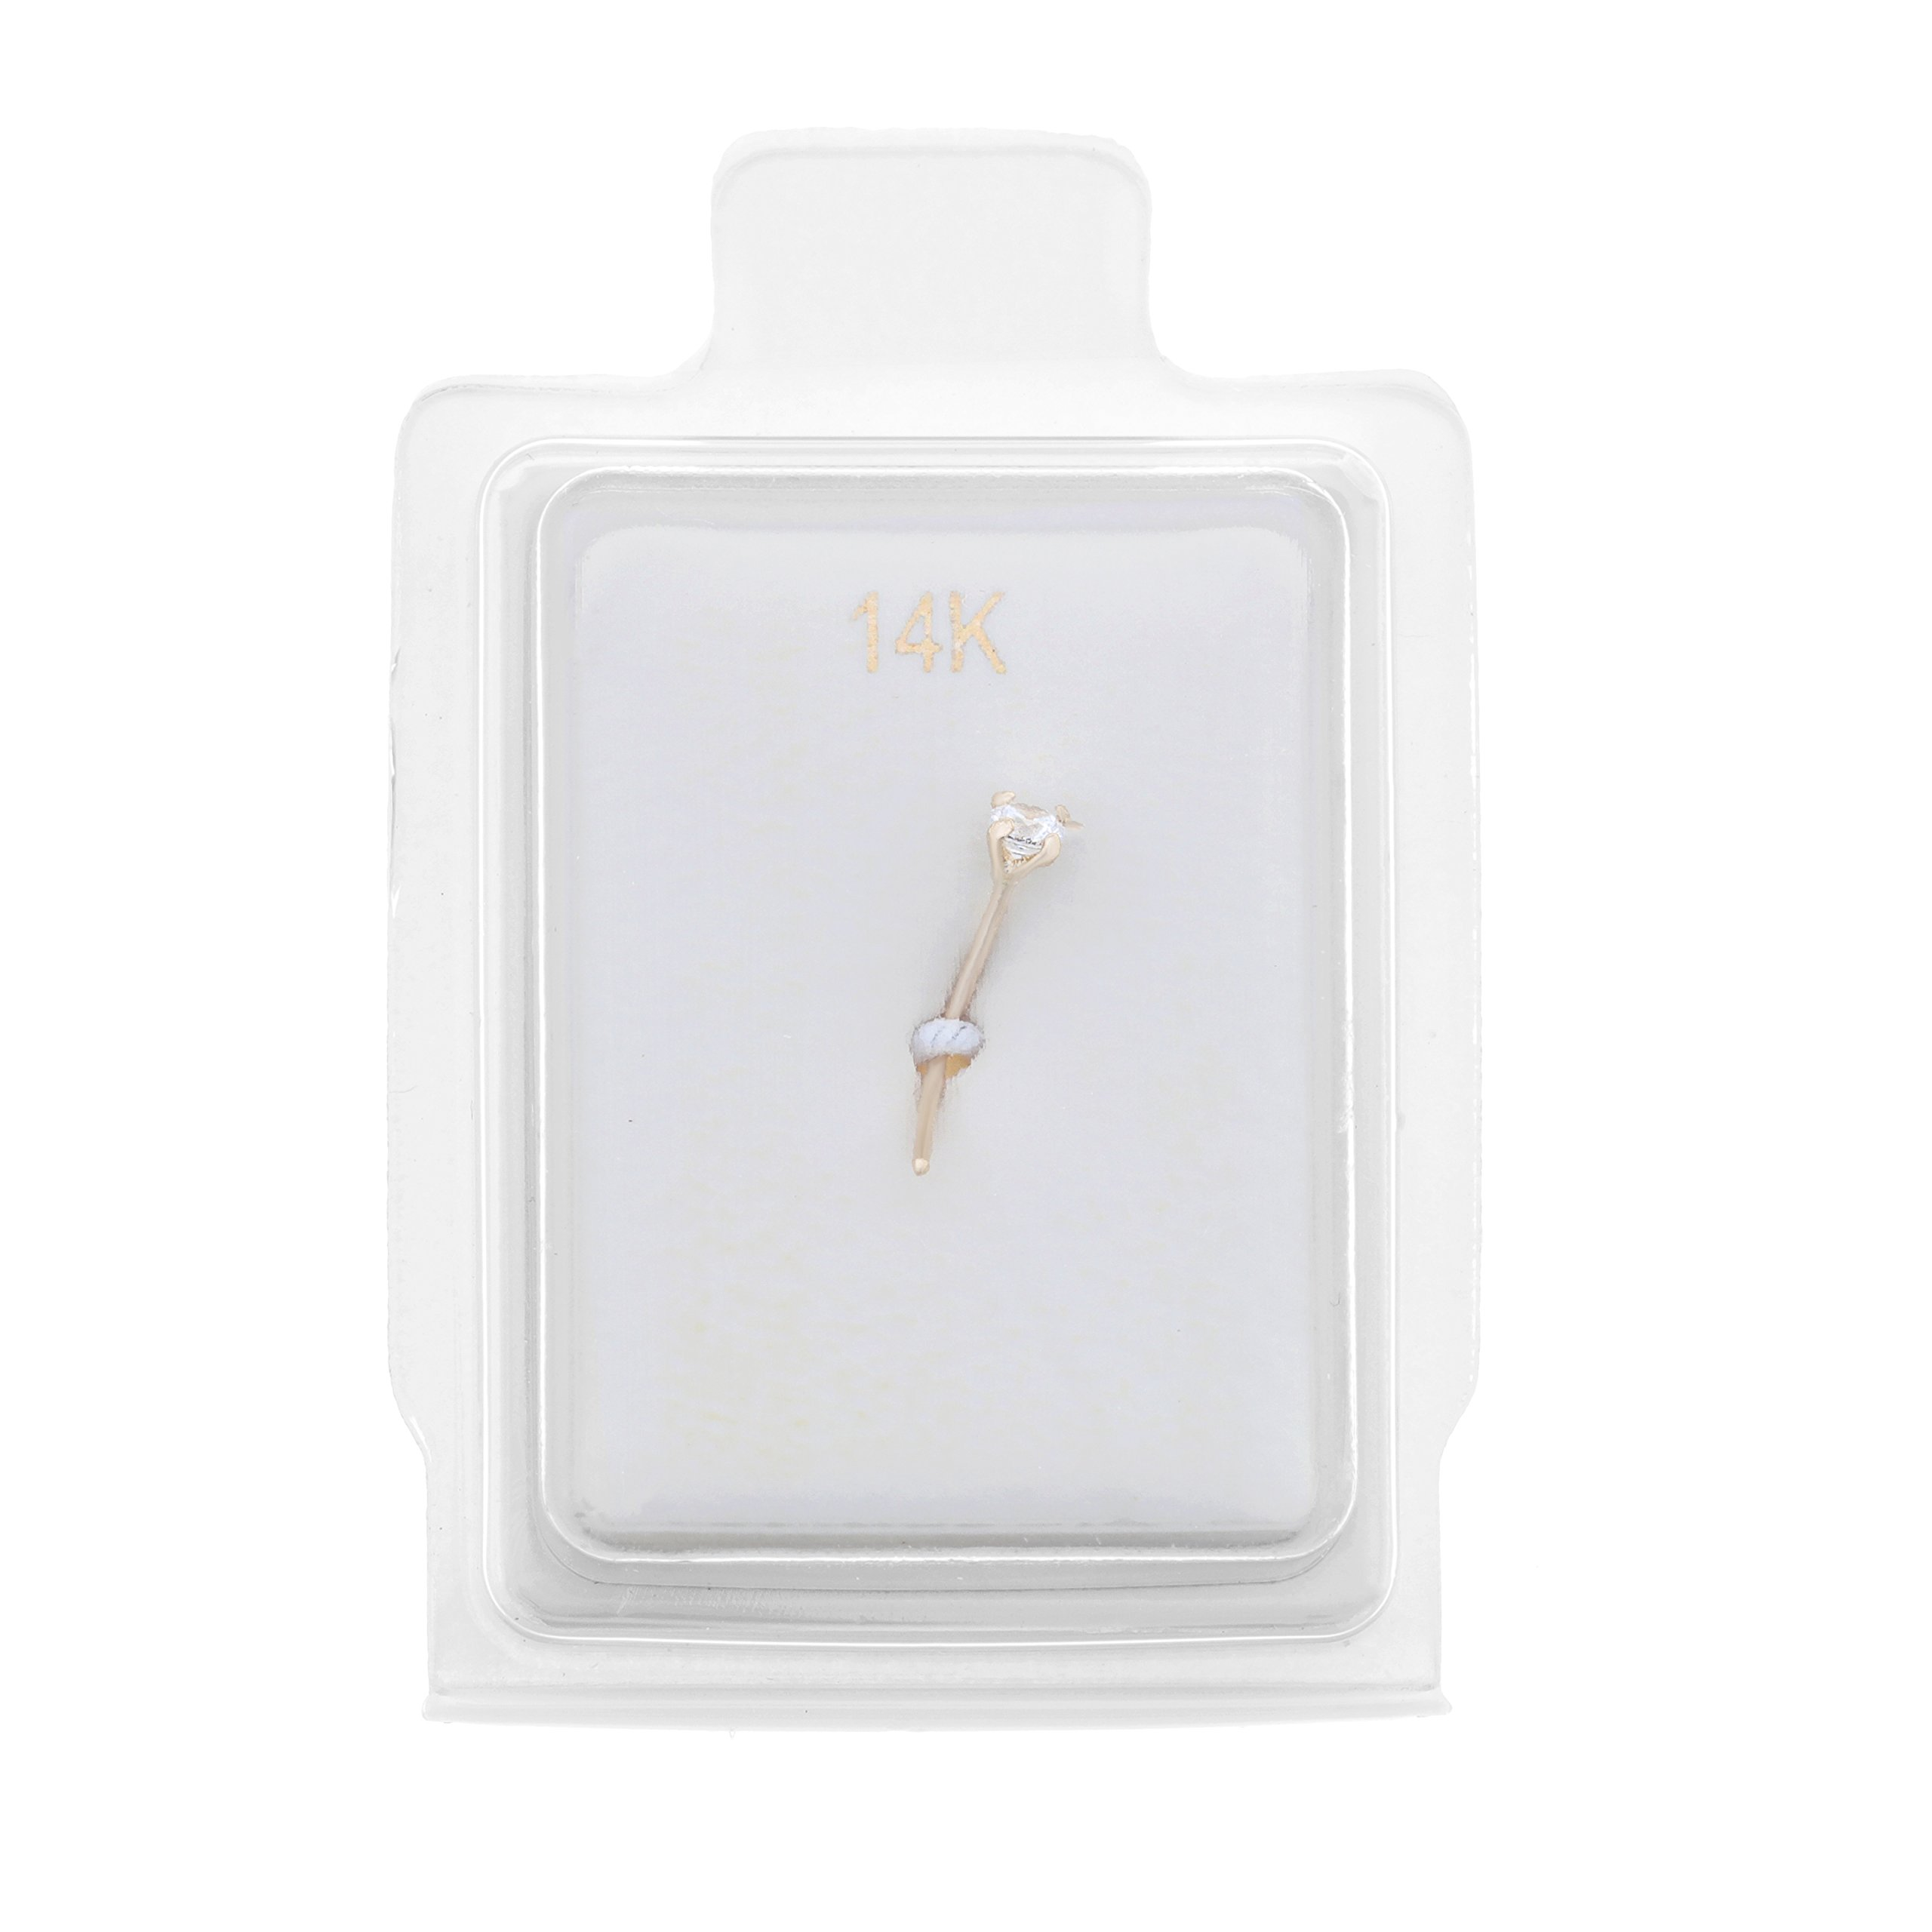 14K Yellow Gold 3mm White Cubic Zirconium Nose Ring L-Shape 22G